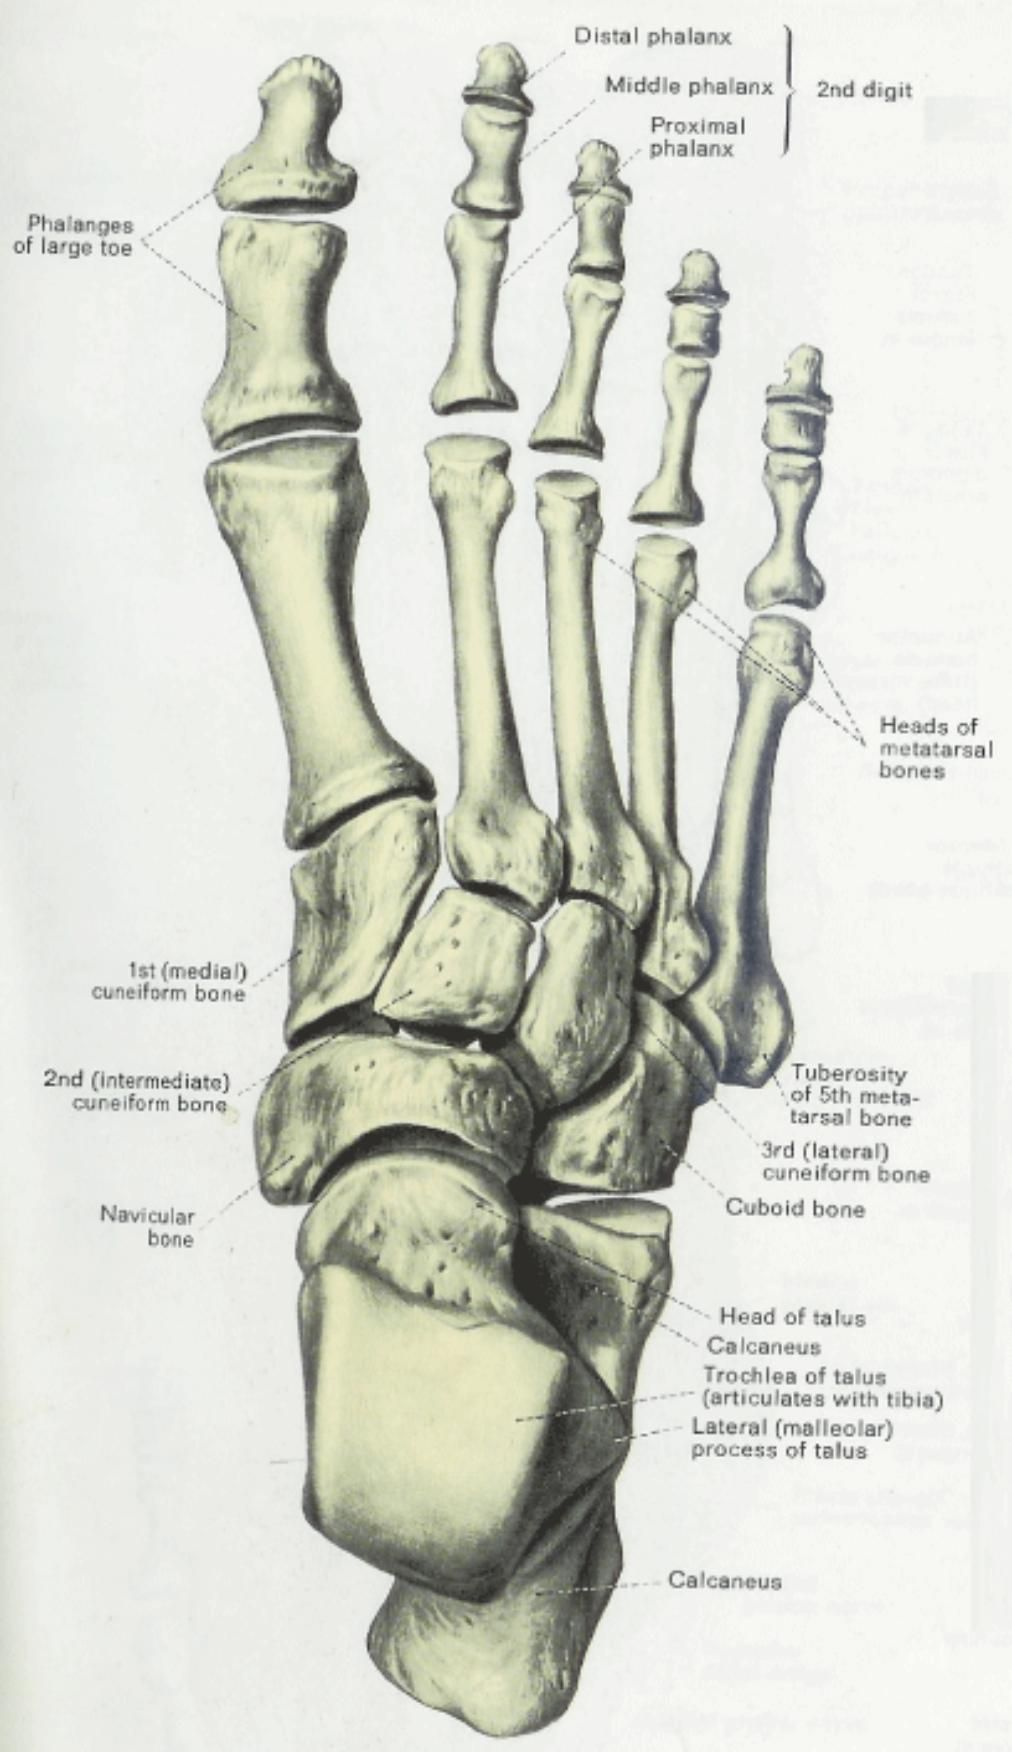 hight resolution of anatomy physiology illustration